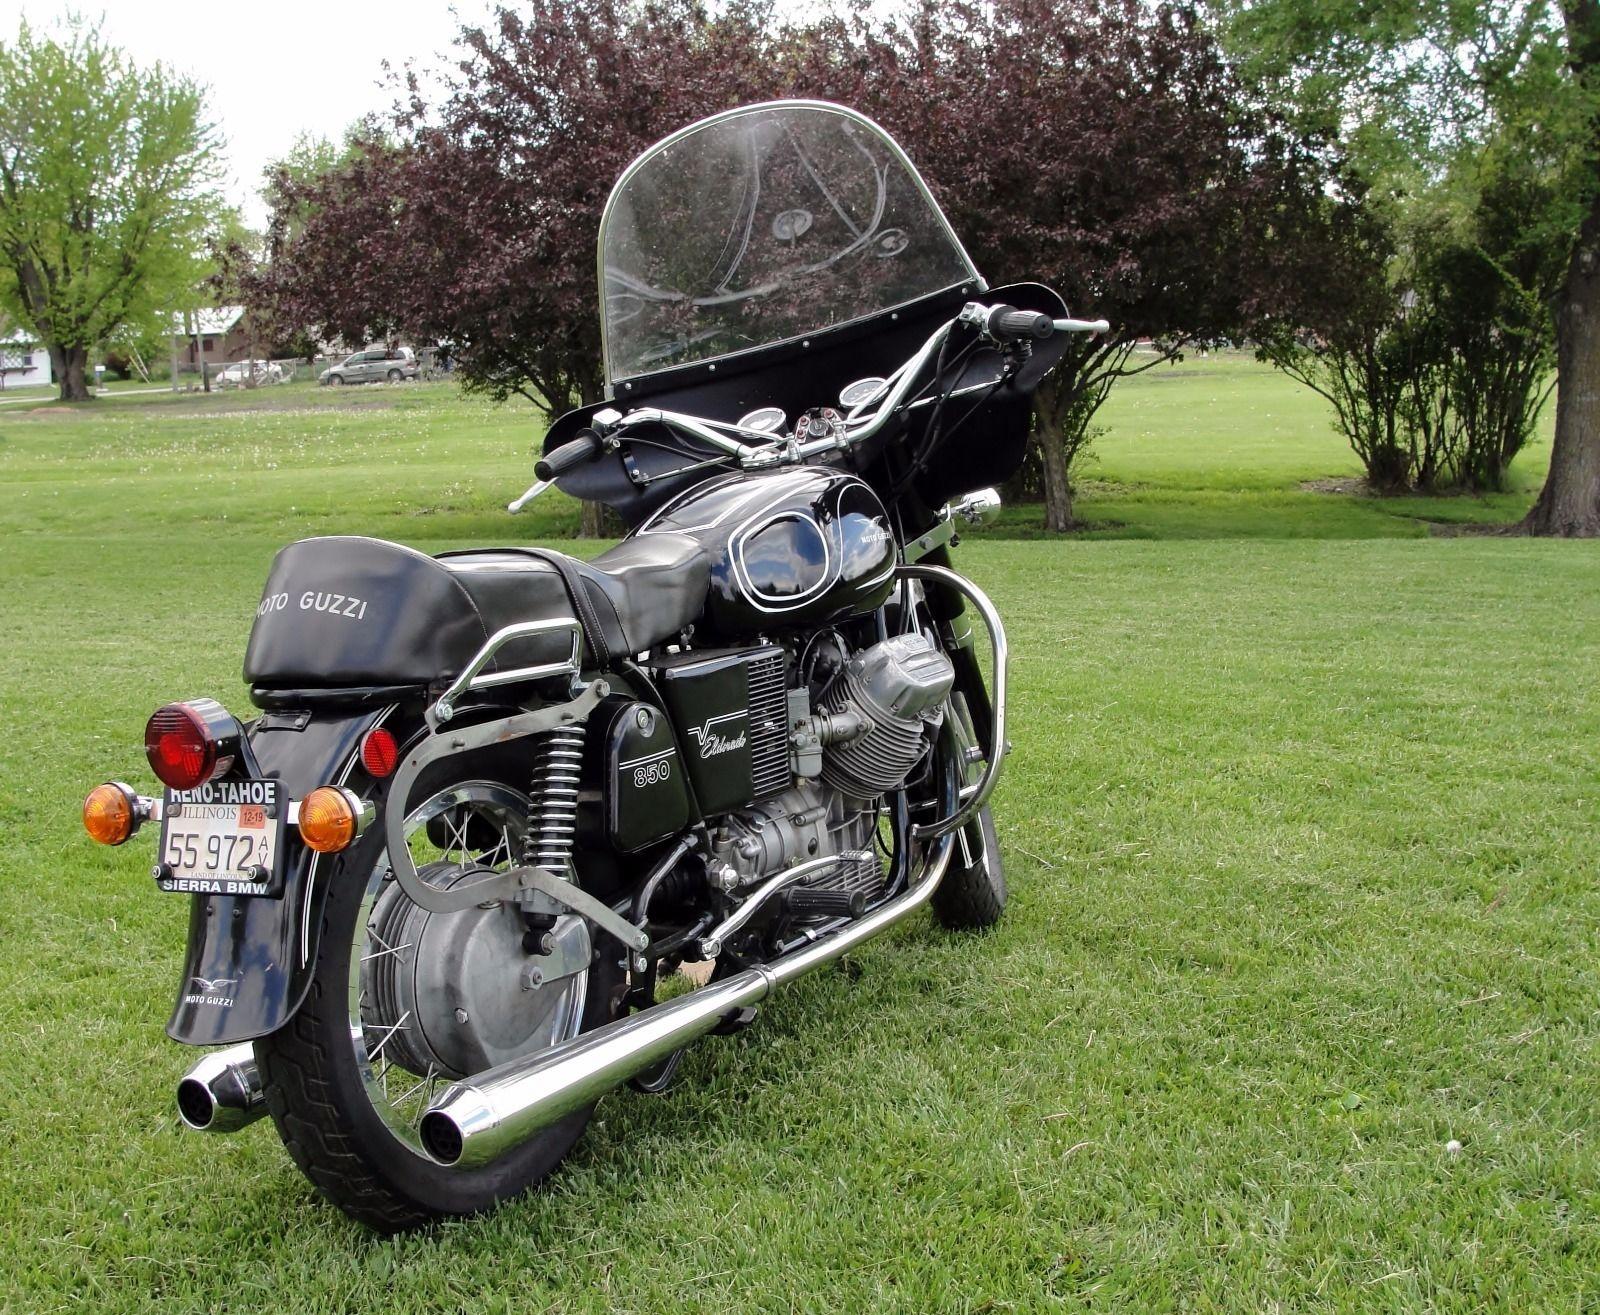 27 Years In Storage 1973 Moto Guzzi 850 Eldorado